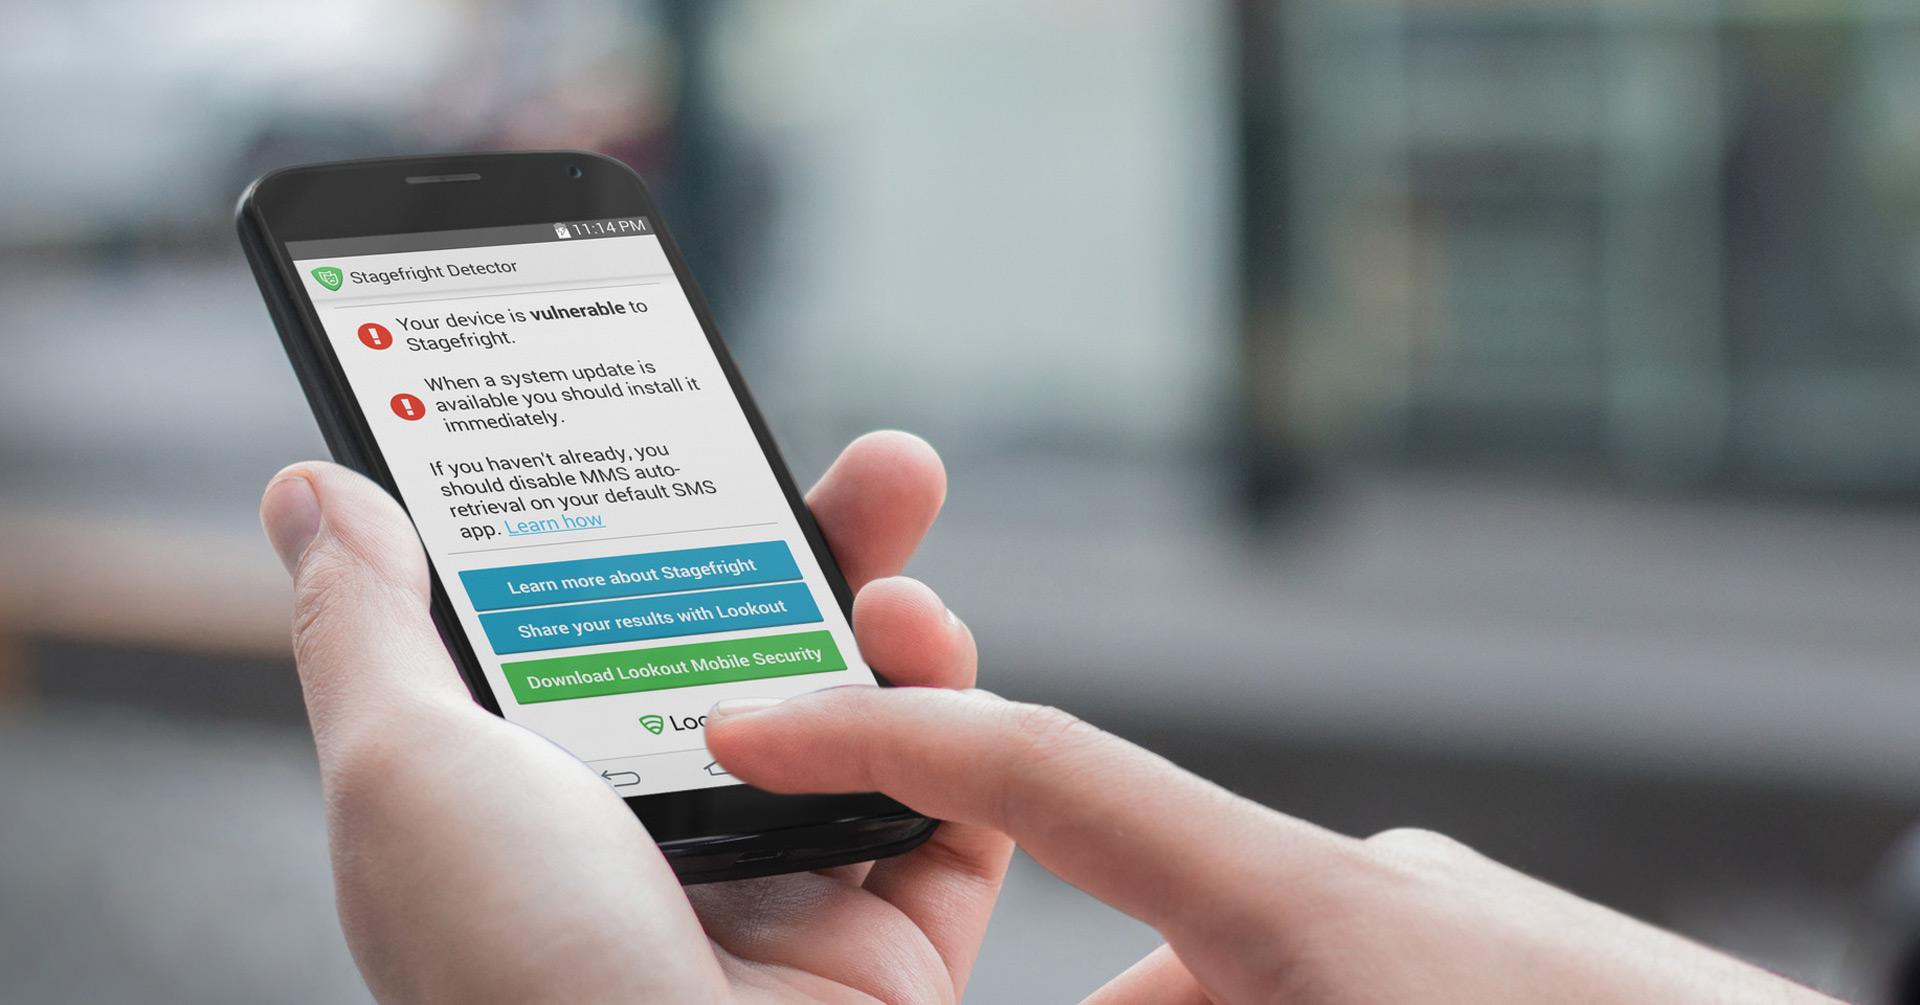 Stagefright Detector determina si tu celular es vulnerable ante el fallo que ataca a 95% de usuarios